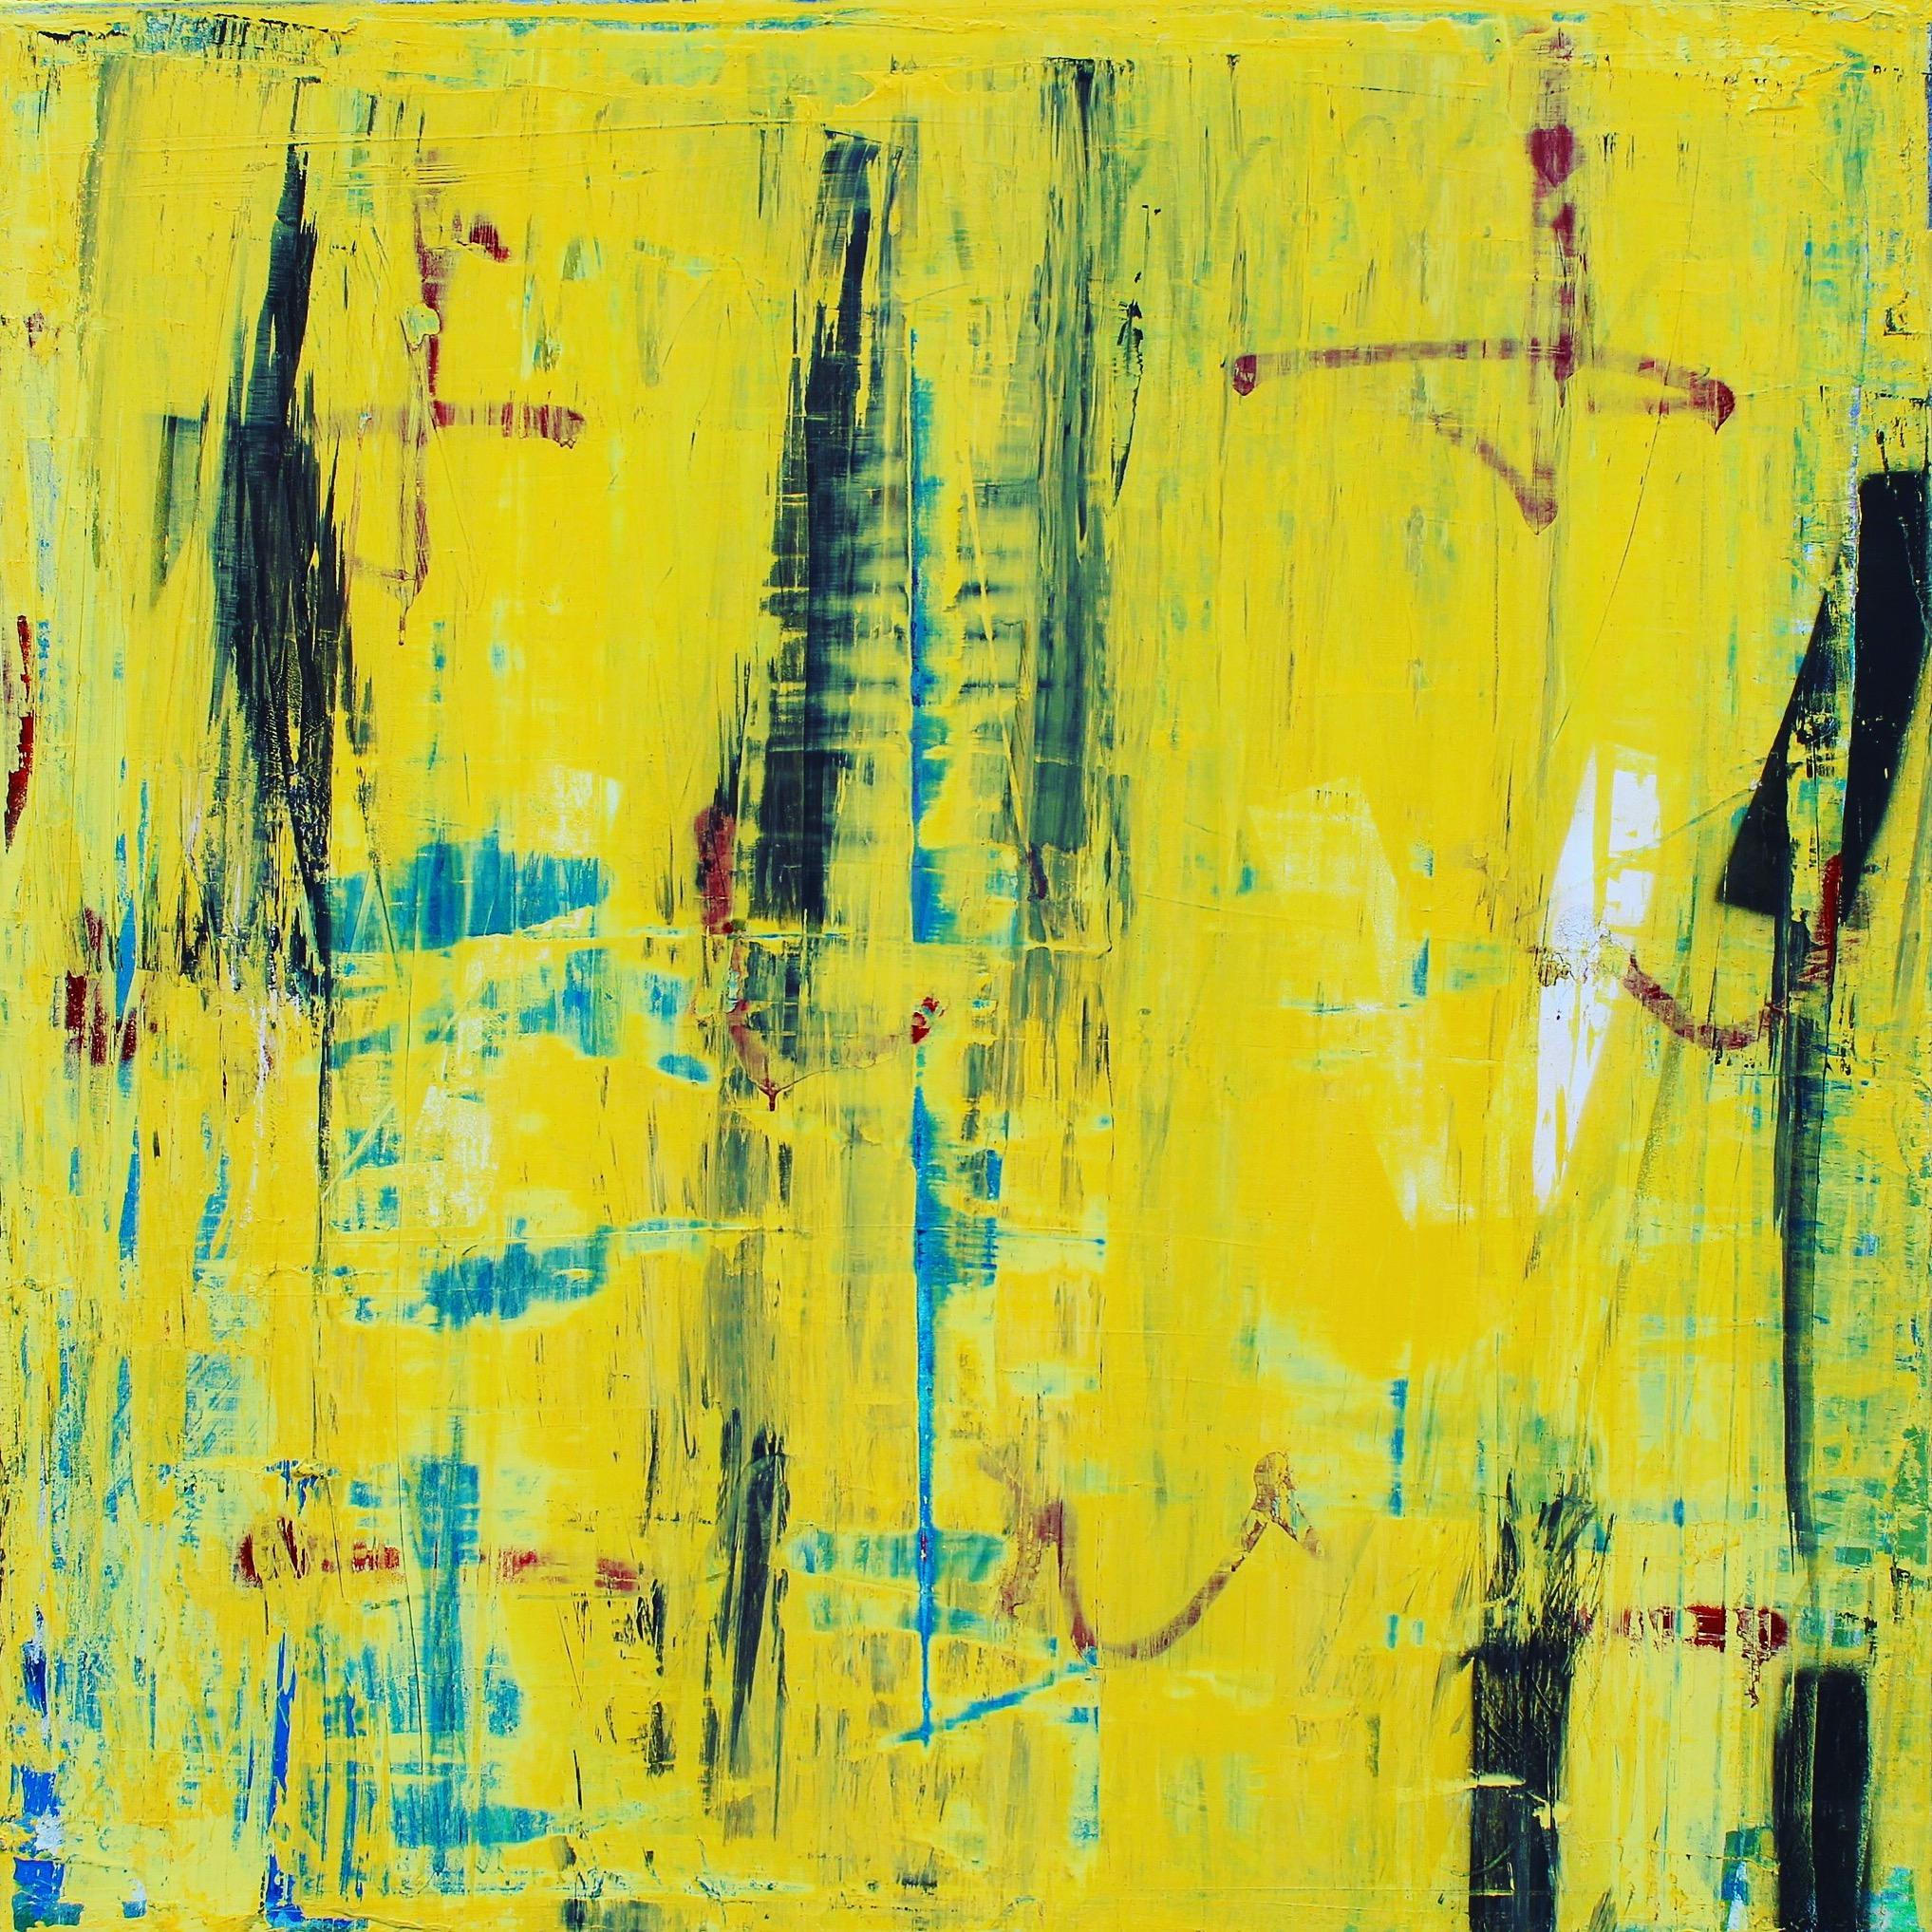 Imitation of Life (Yellow)